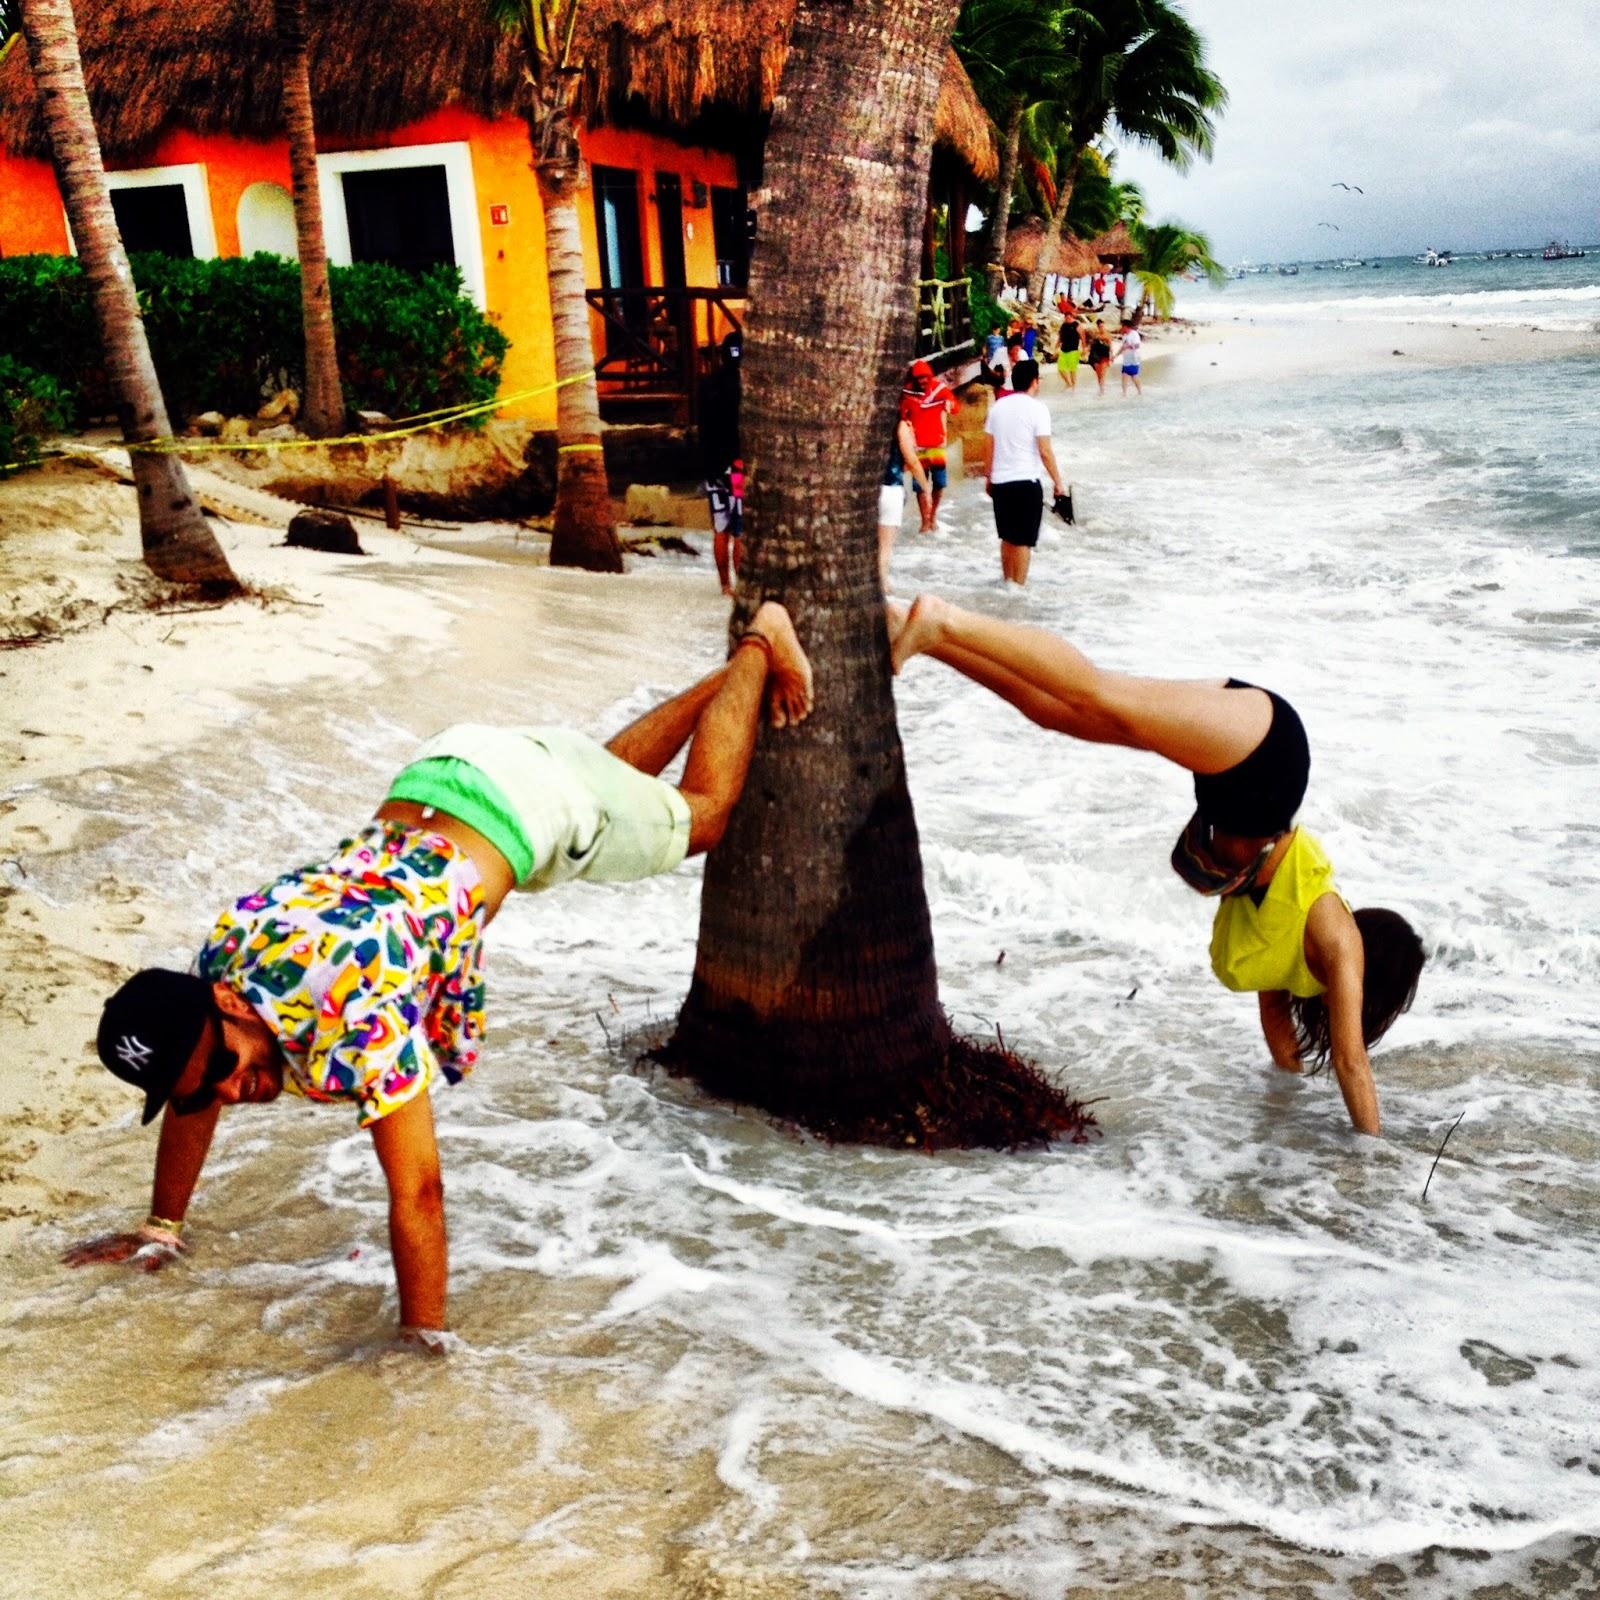 trini palm trees tulum ocean bpm festival stereo night club friends playa del carmen mexico travel more